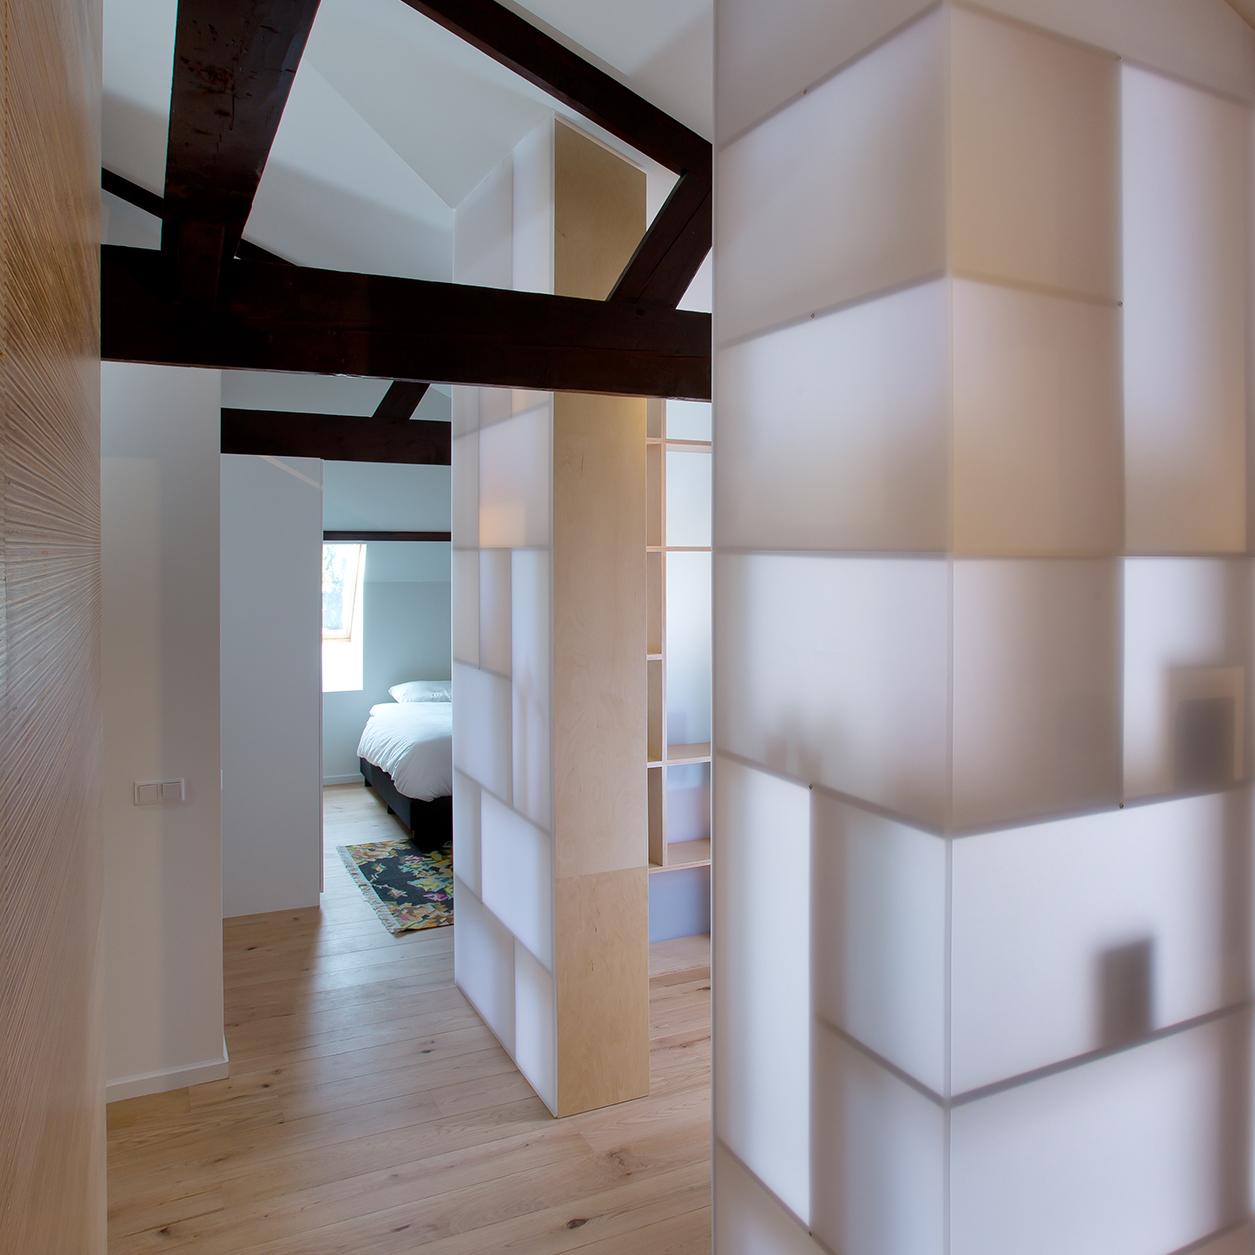 Interieur Design Gemert.Idg Interieurbouw